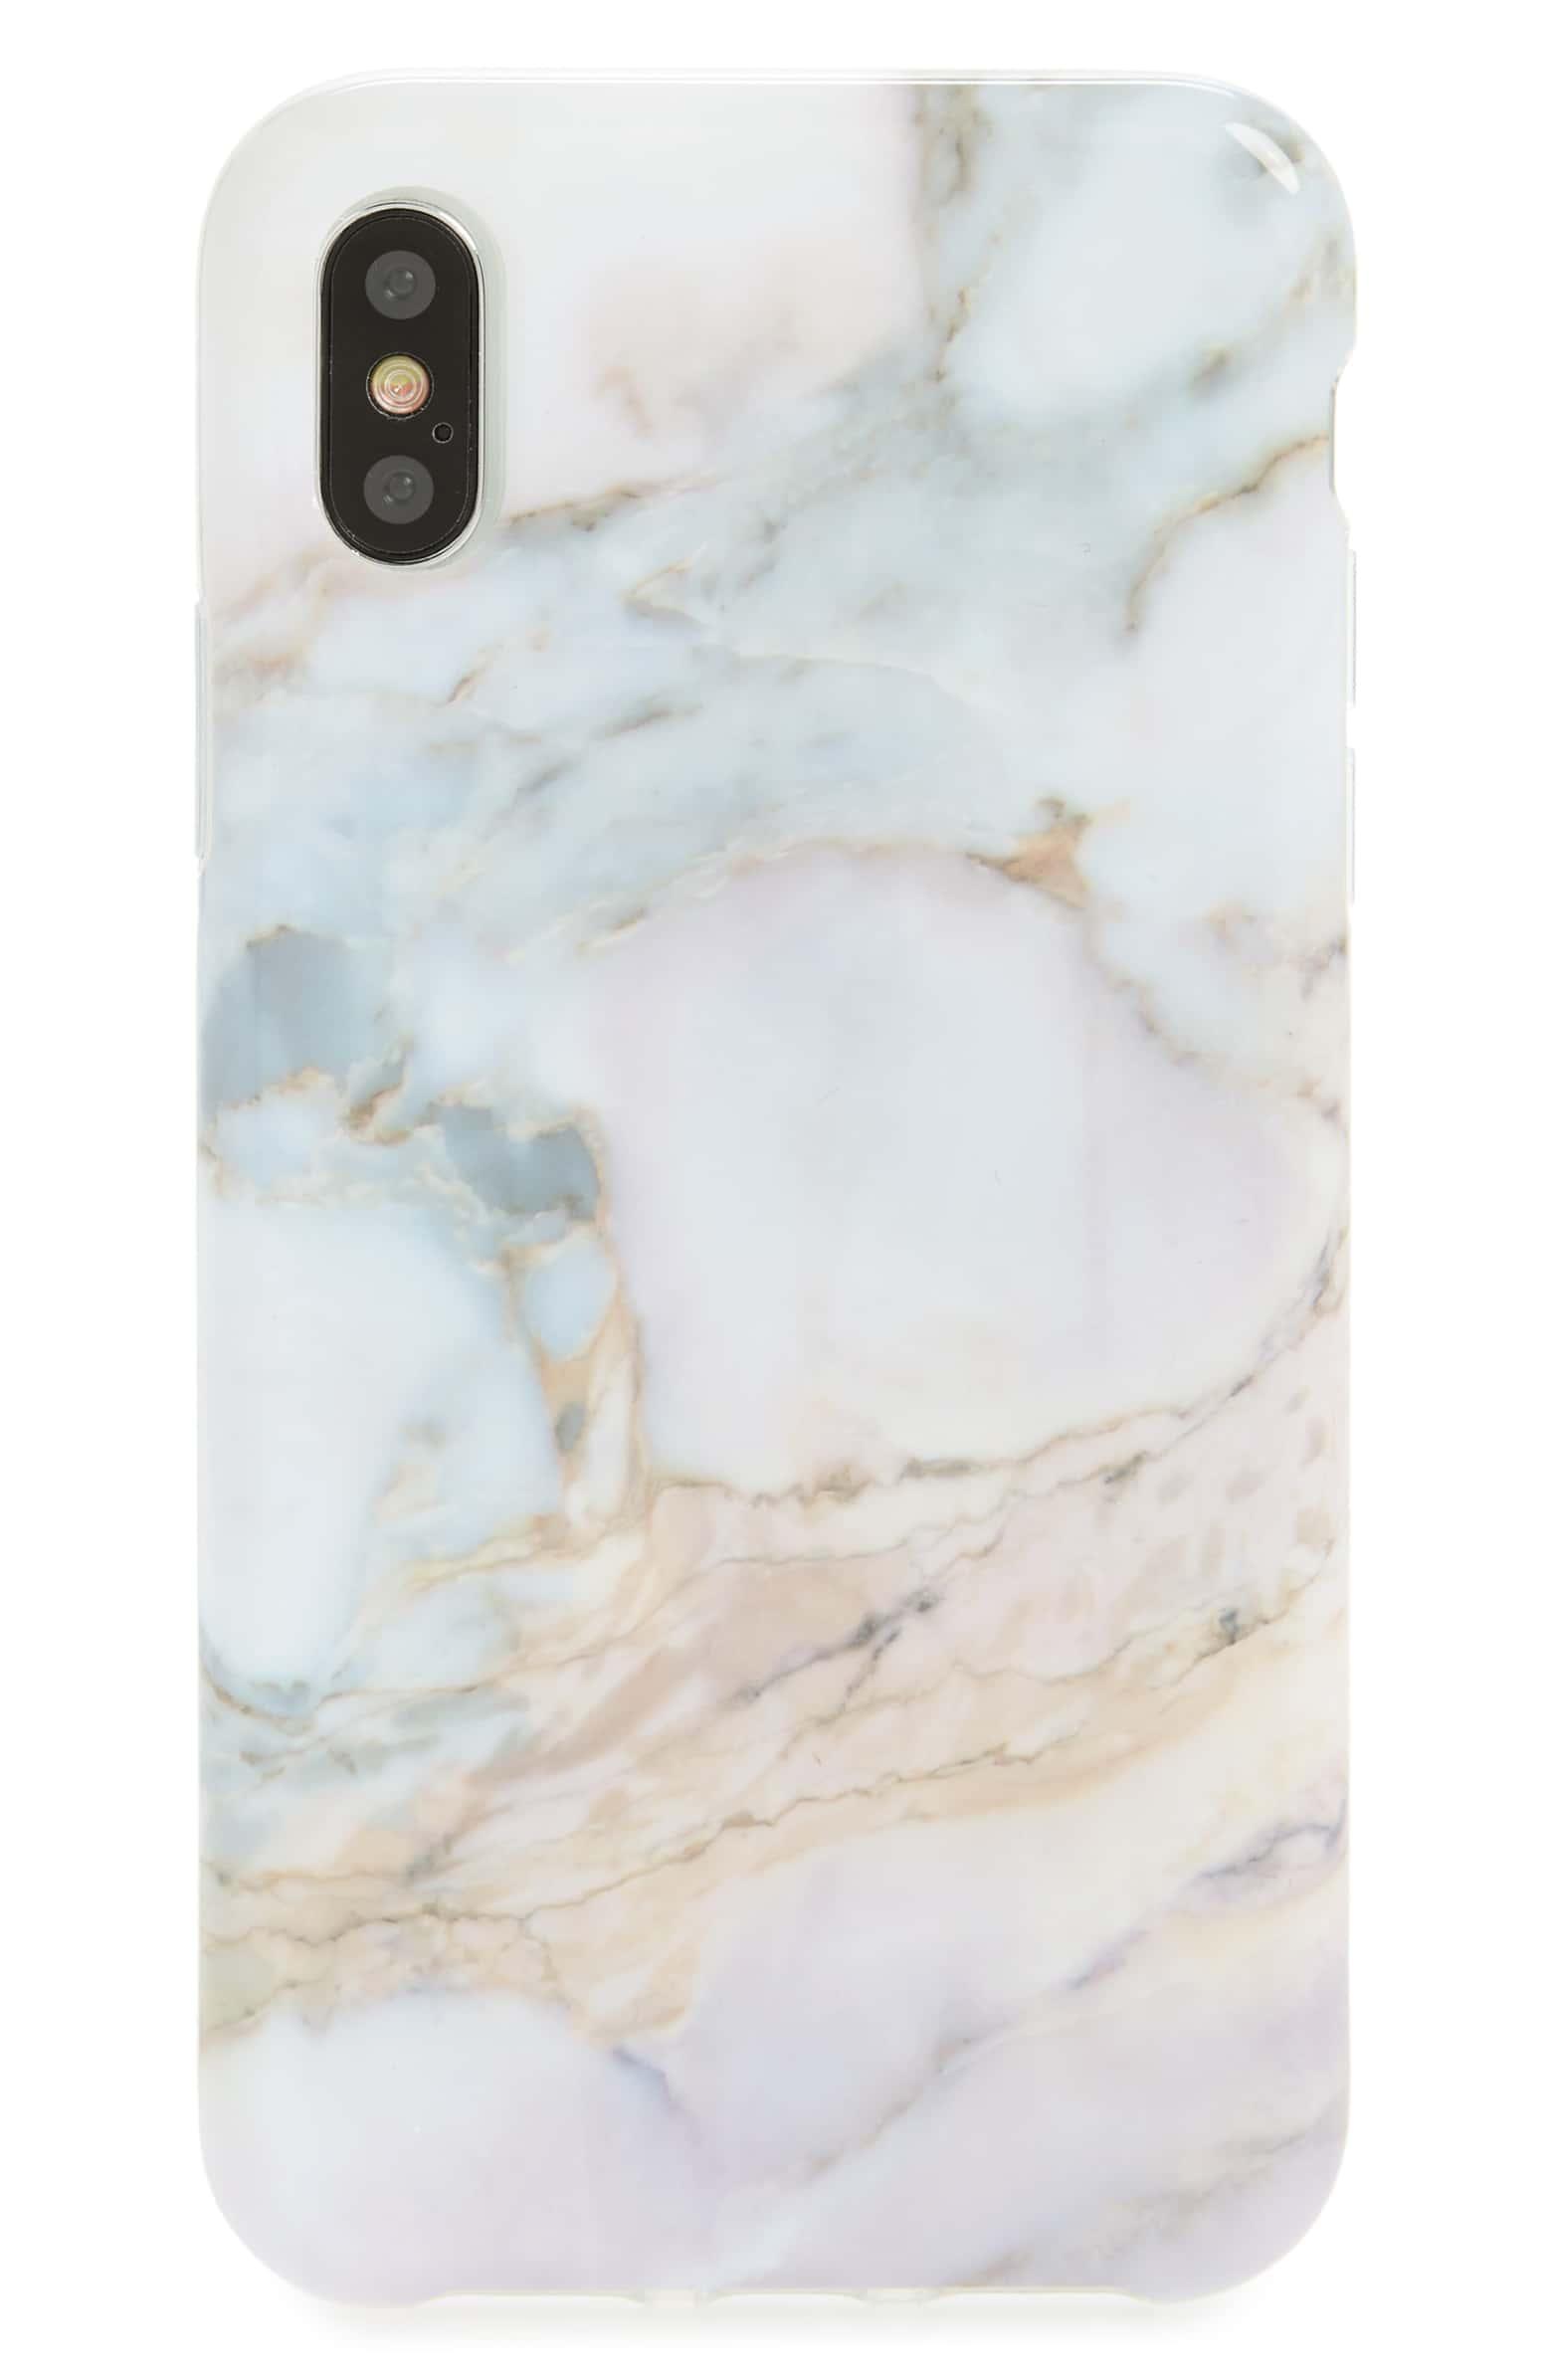 gemstone iphone cover.jpg